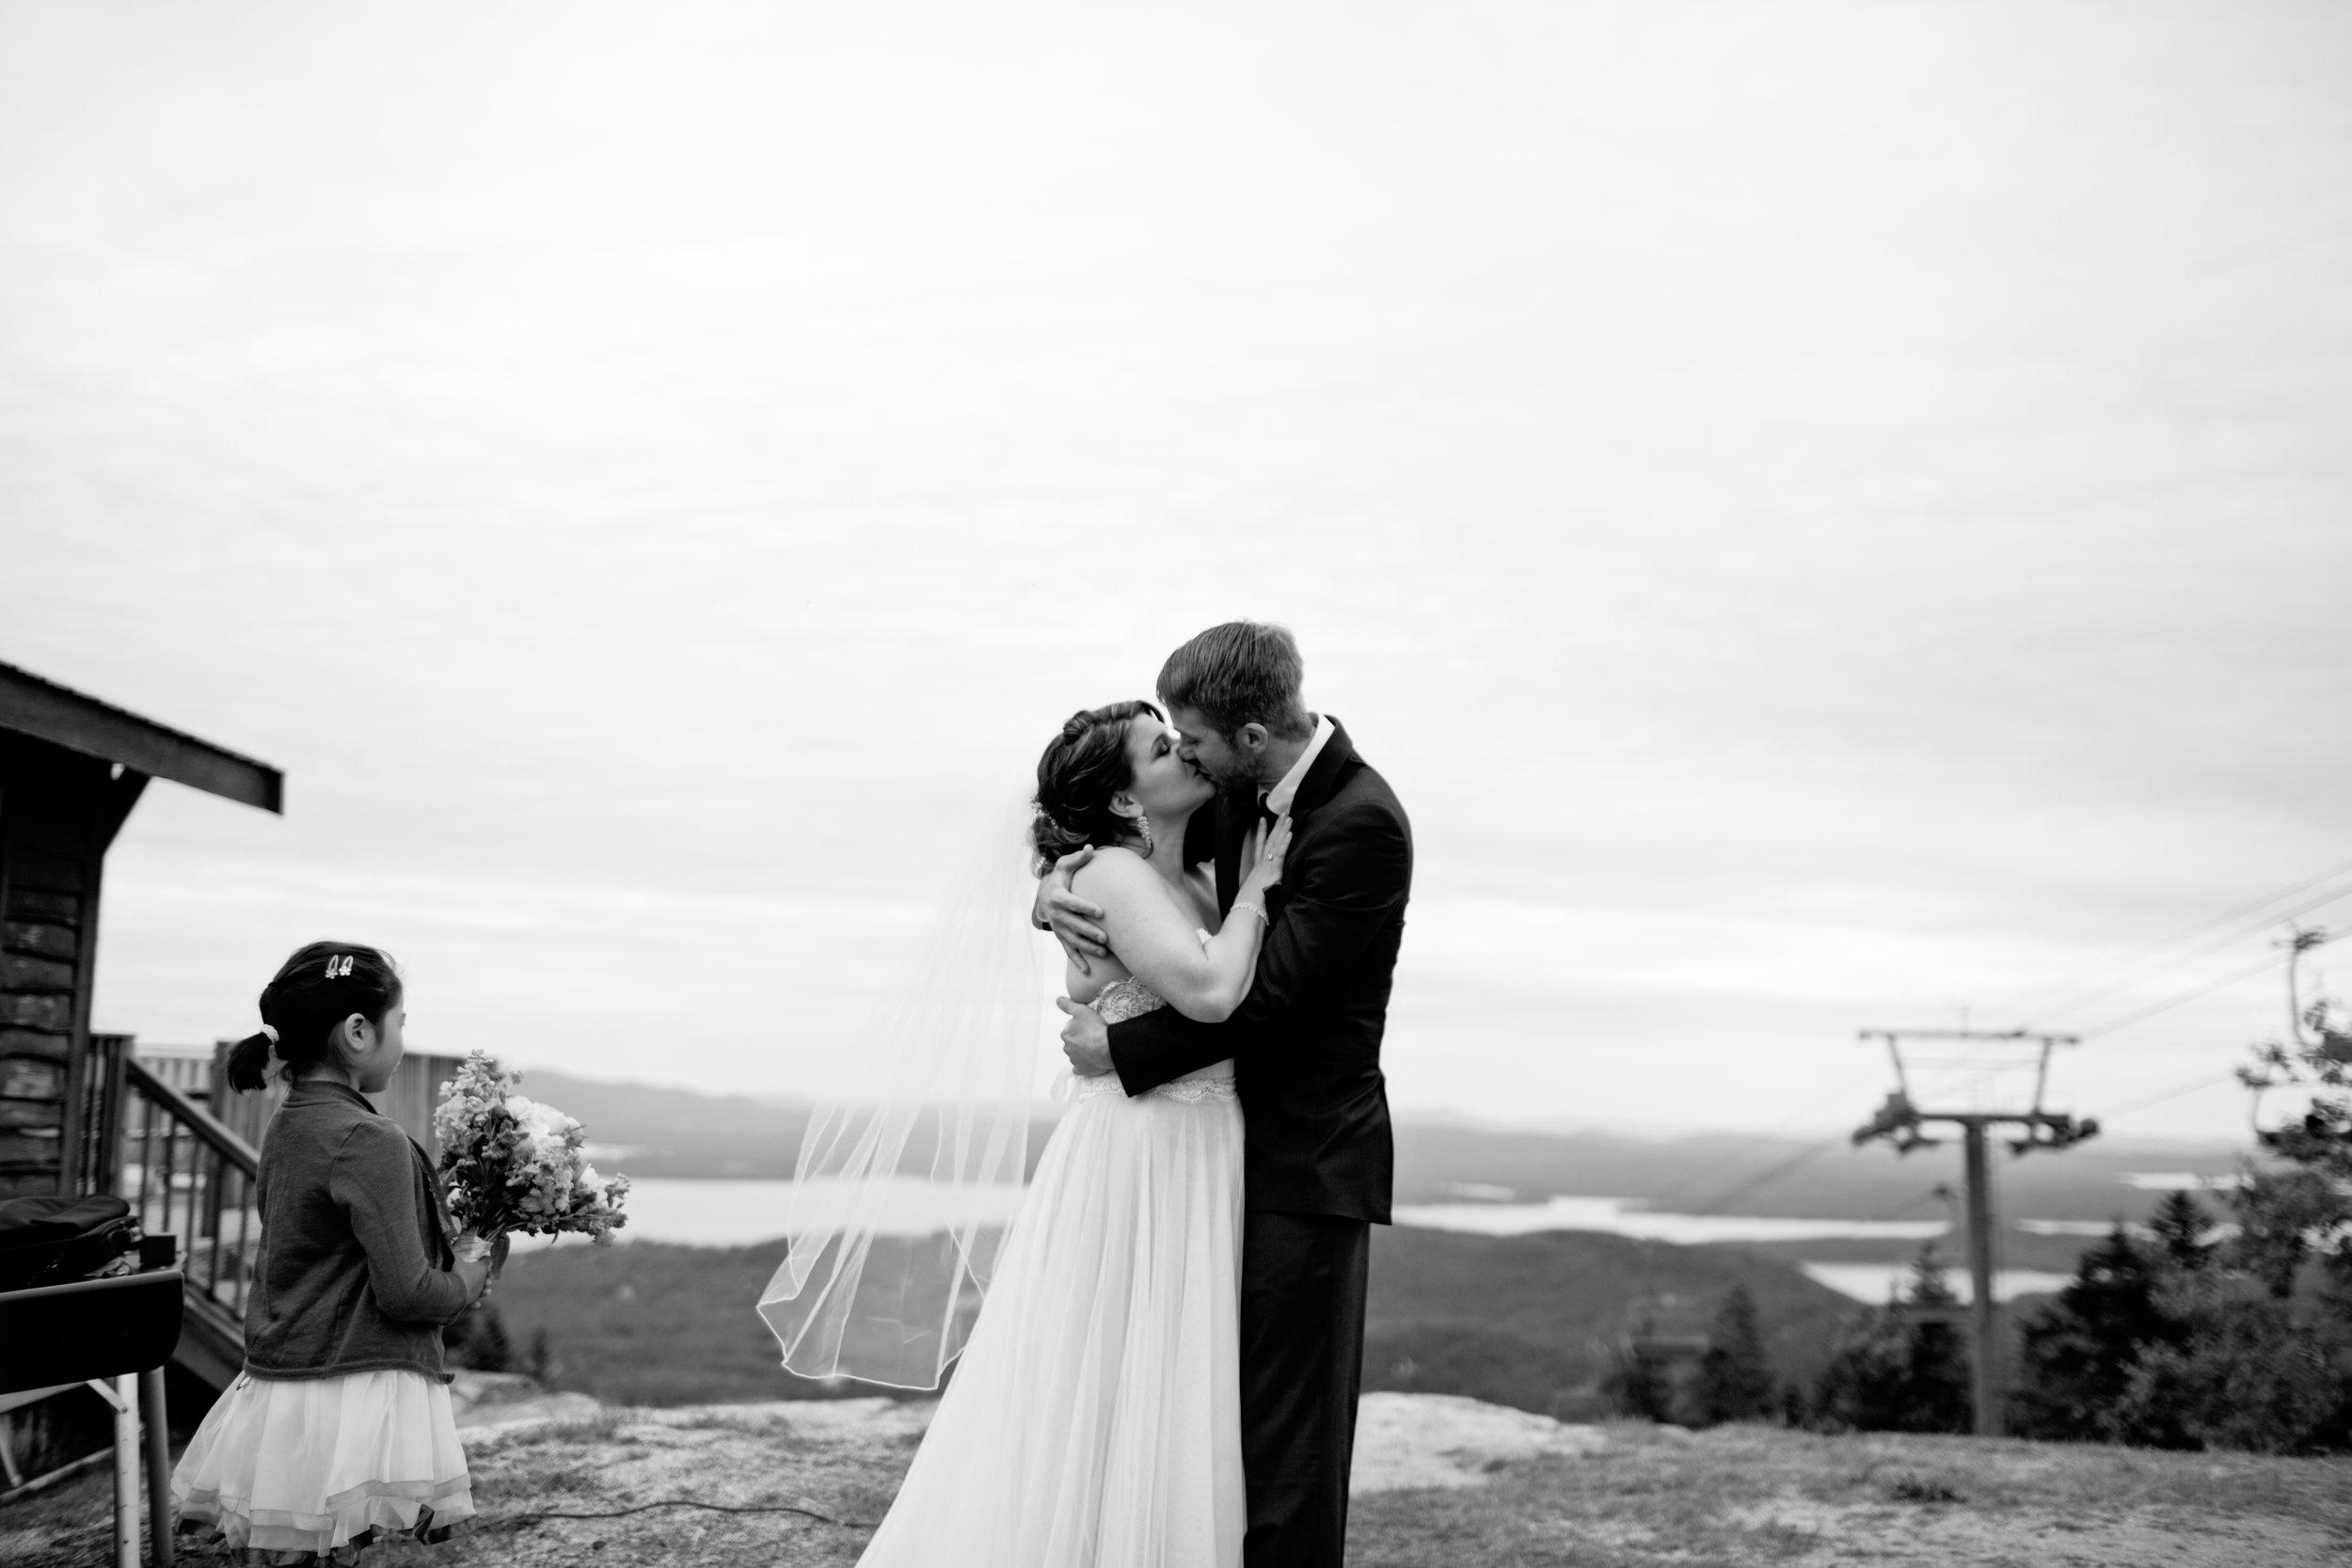 gunstock-mountain-resort-wedding-photos-16.JPG